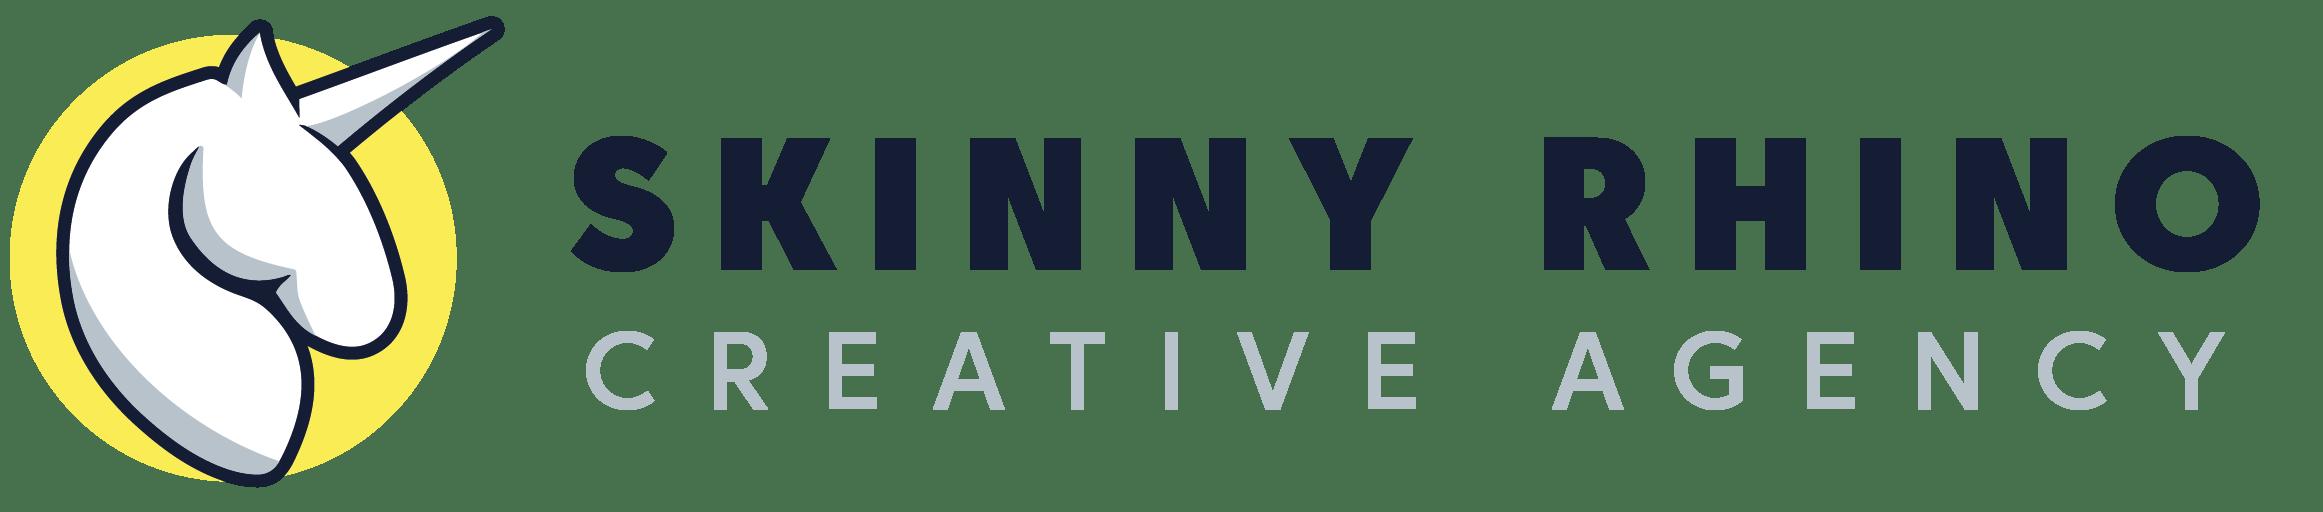 Skinny Rhino